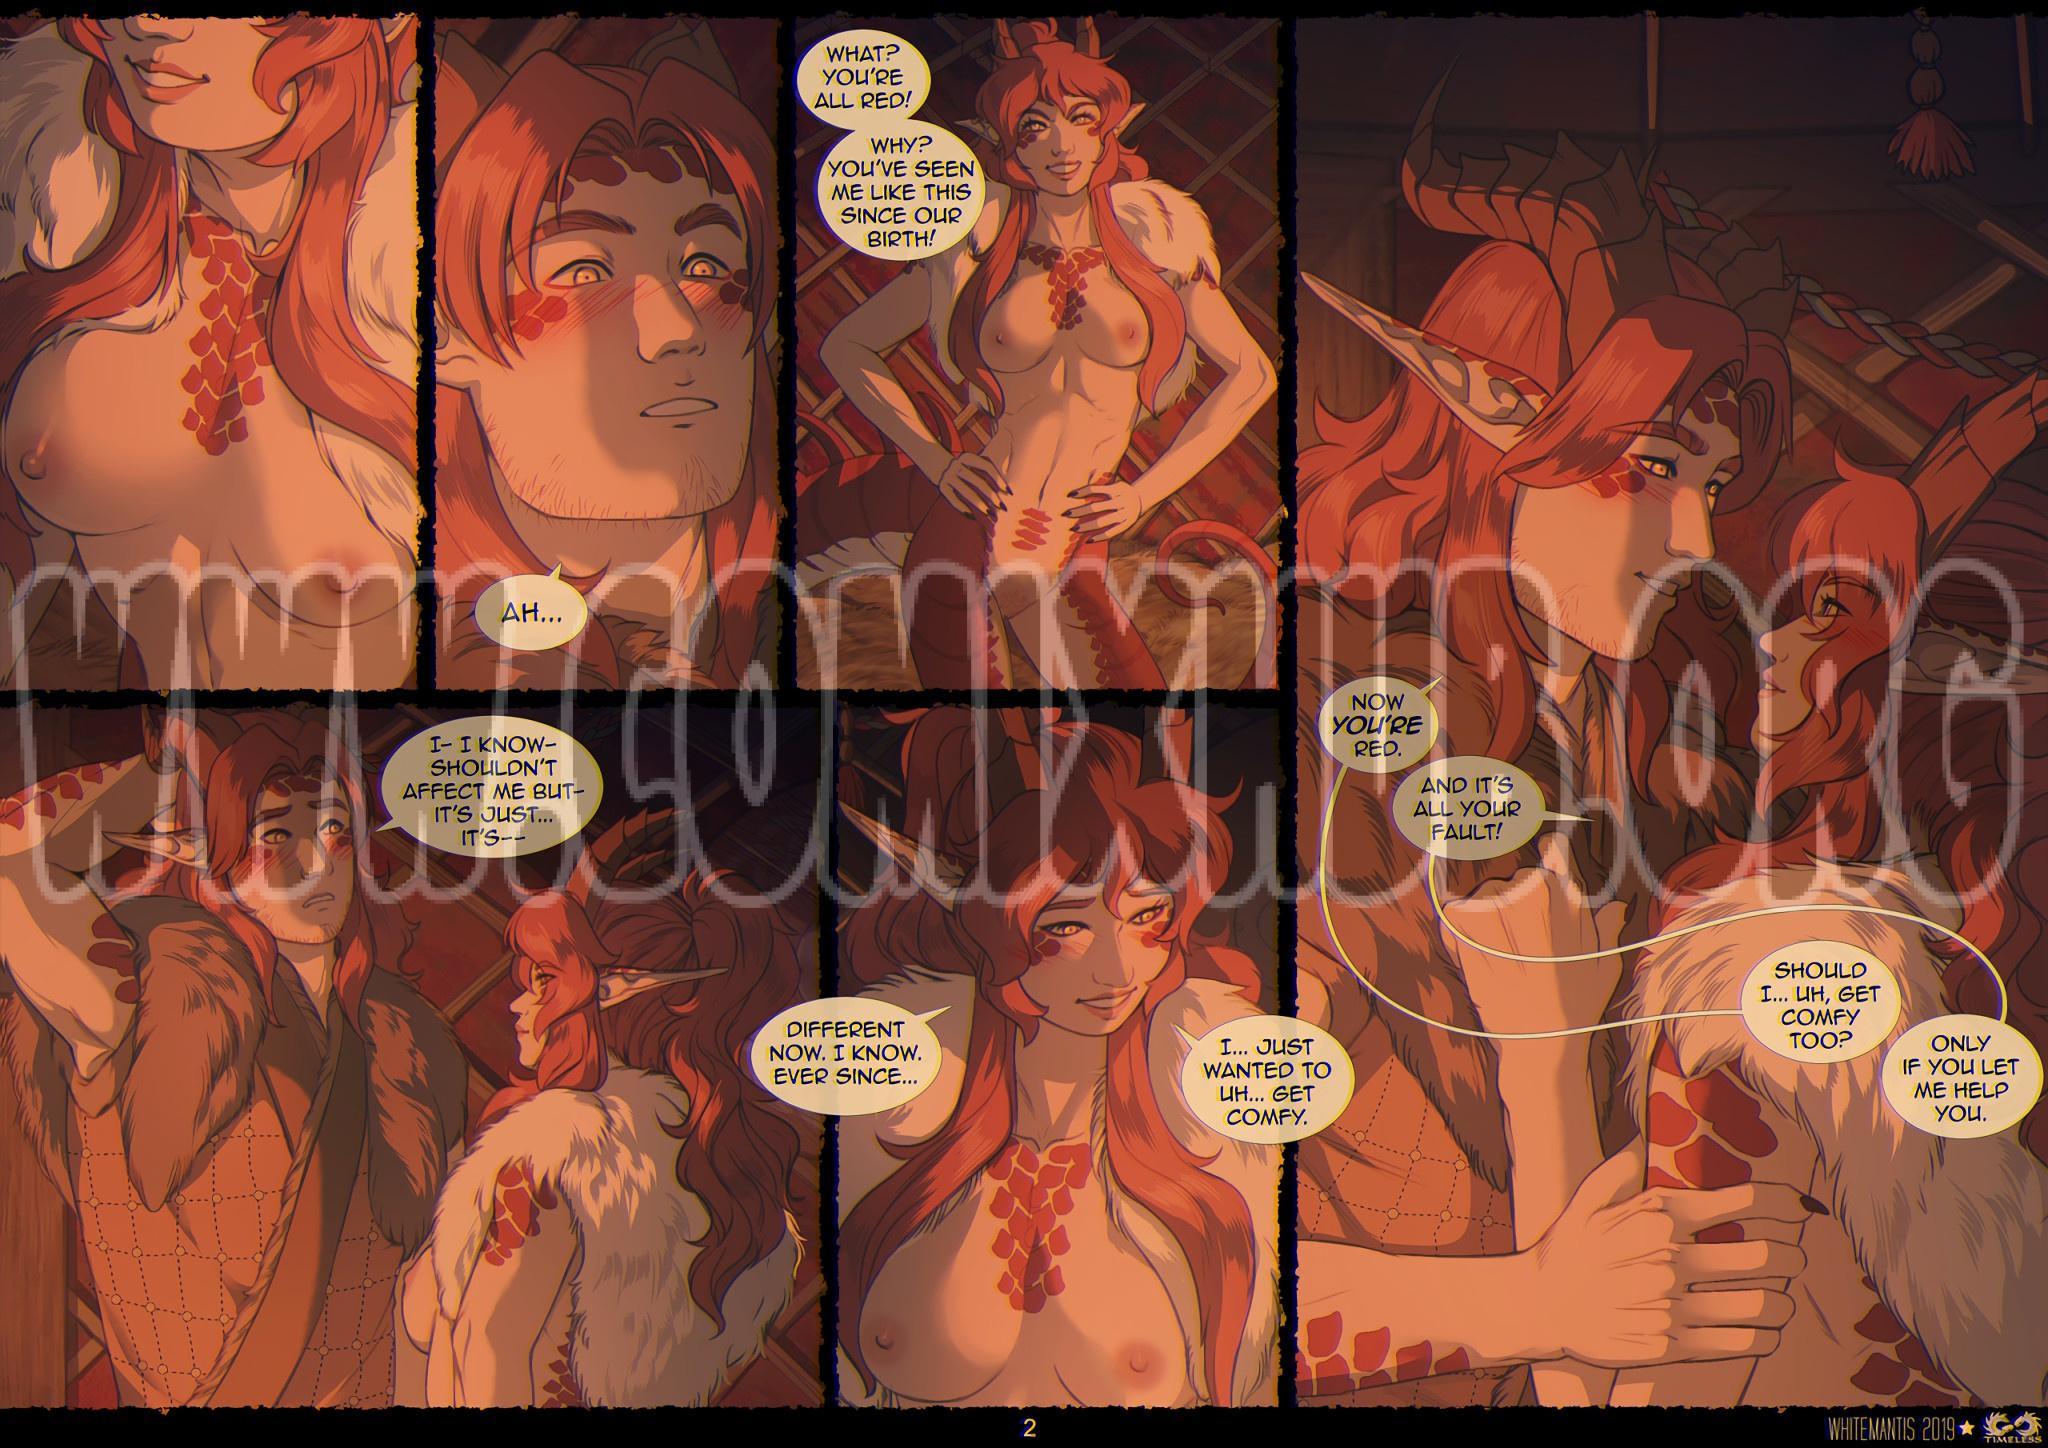 Timeless: Unto You porn comics Oral sex, cunnilingus, Fantasy